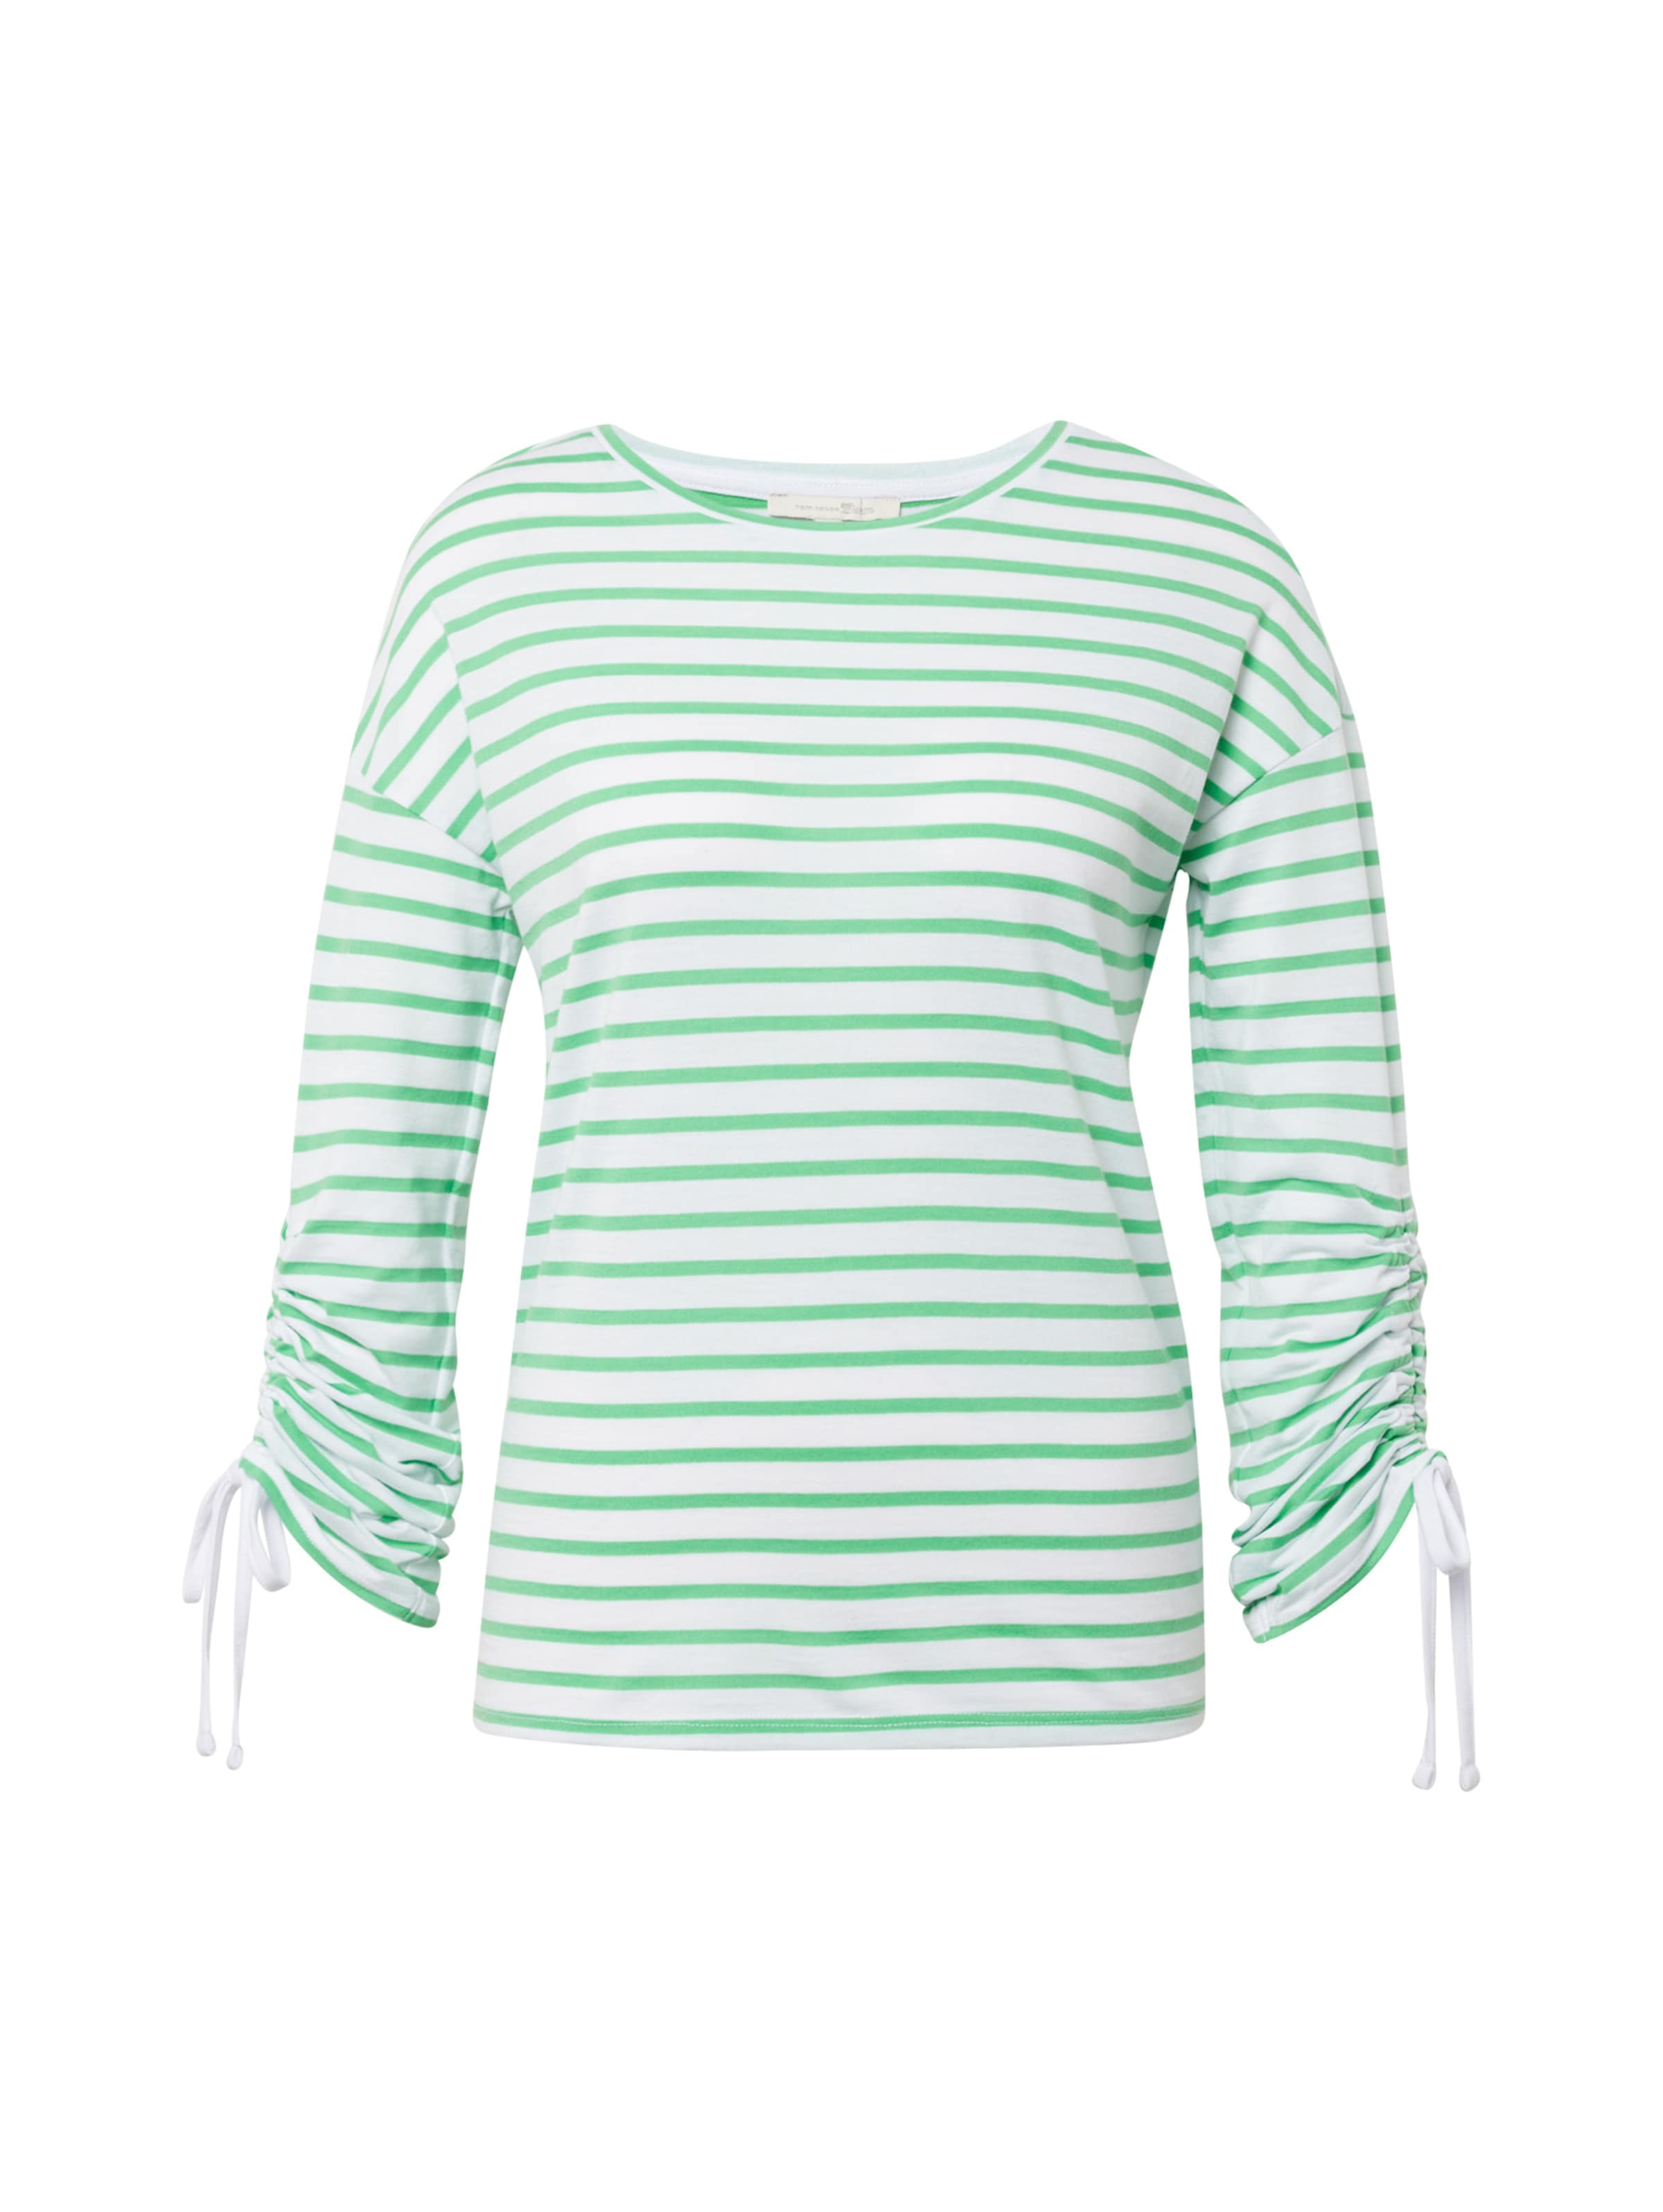 Tailor T LimetteWeiß Tom In Denim shirt gfY7Ib6yv